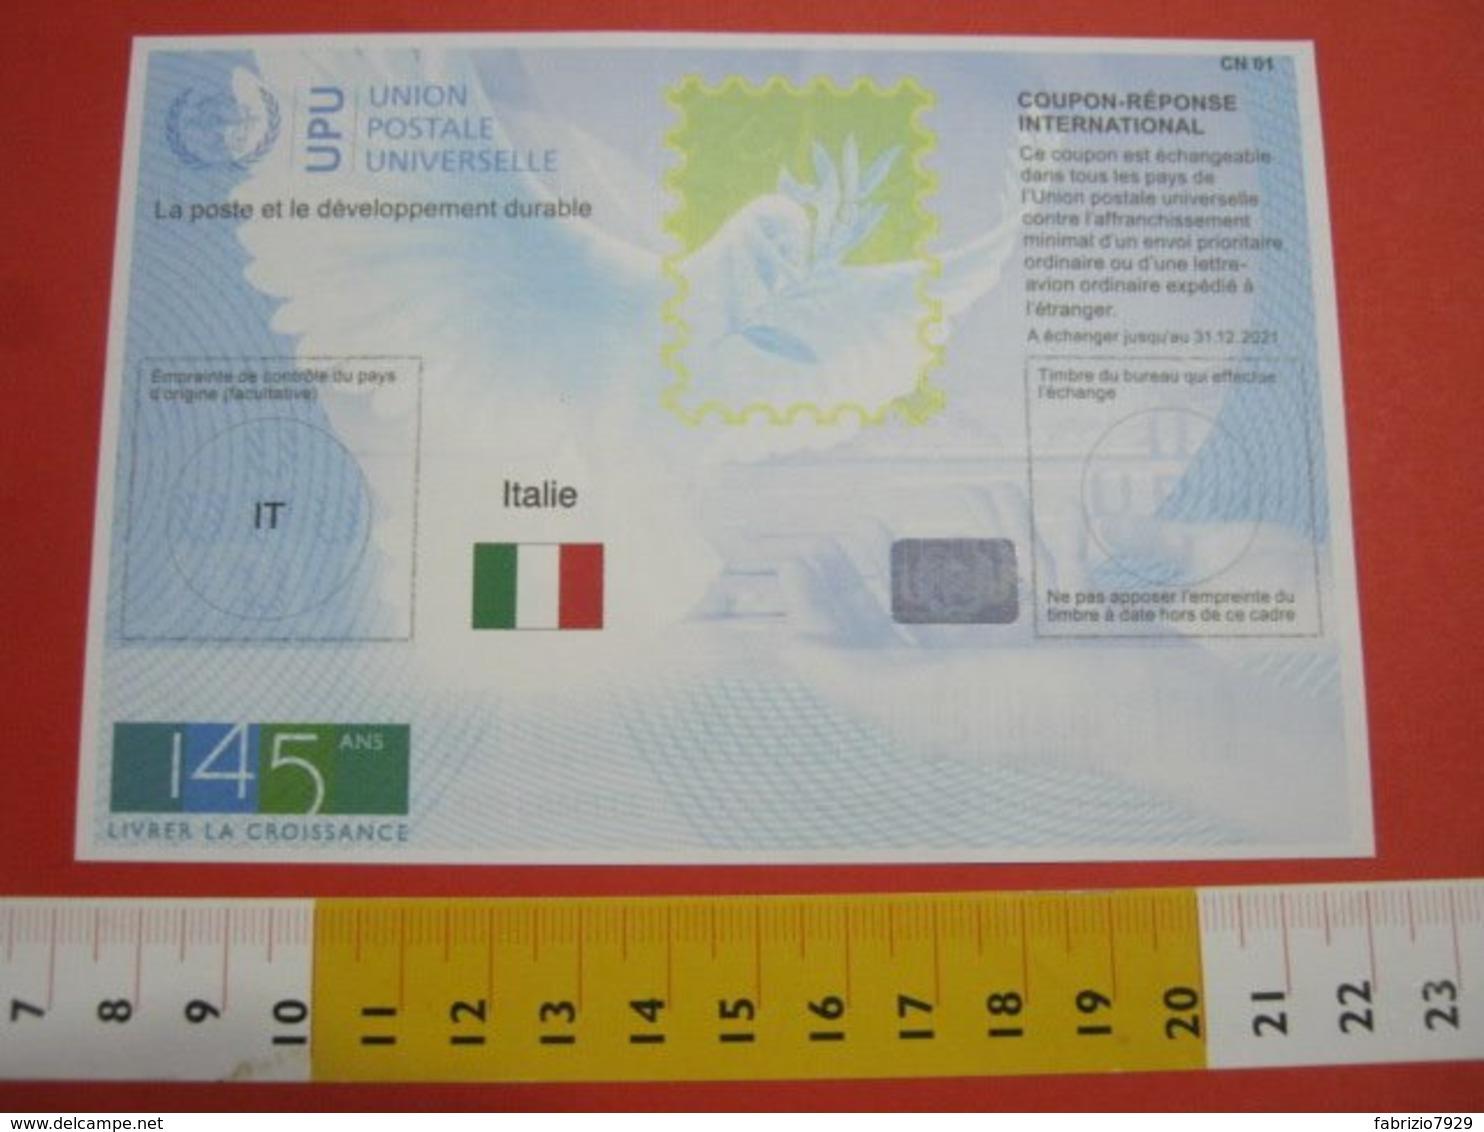 AAA.1 ITALIA  ITALY ITALIE 2019 IT NEW N. 3 PCS PZ. X COUPON REPONSE INTERNATIONAL 145 ANS UPU UNION POSTALE UNIVERSELLE - UPU (Wereldpostunie)